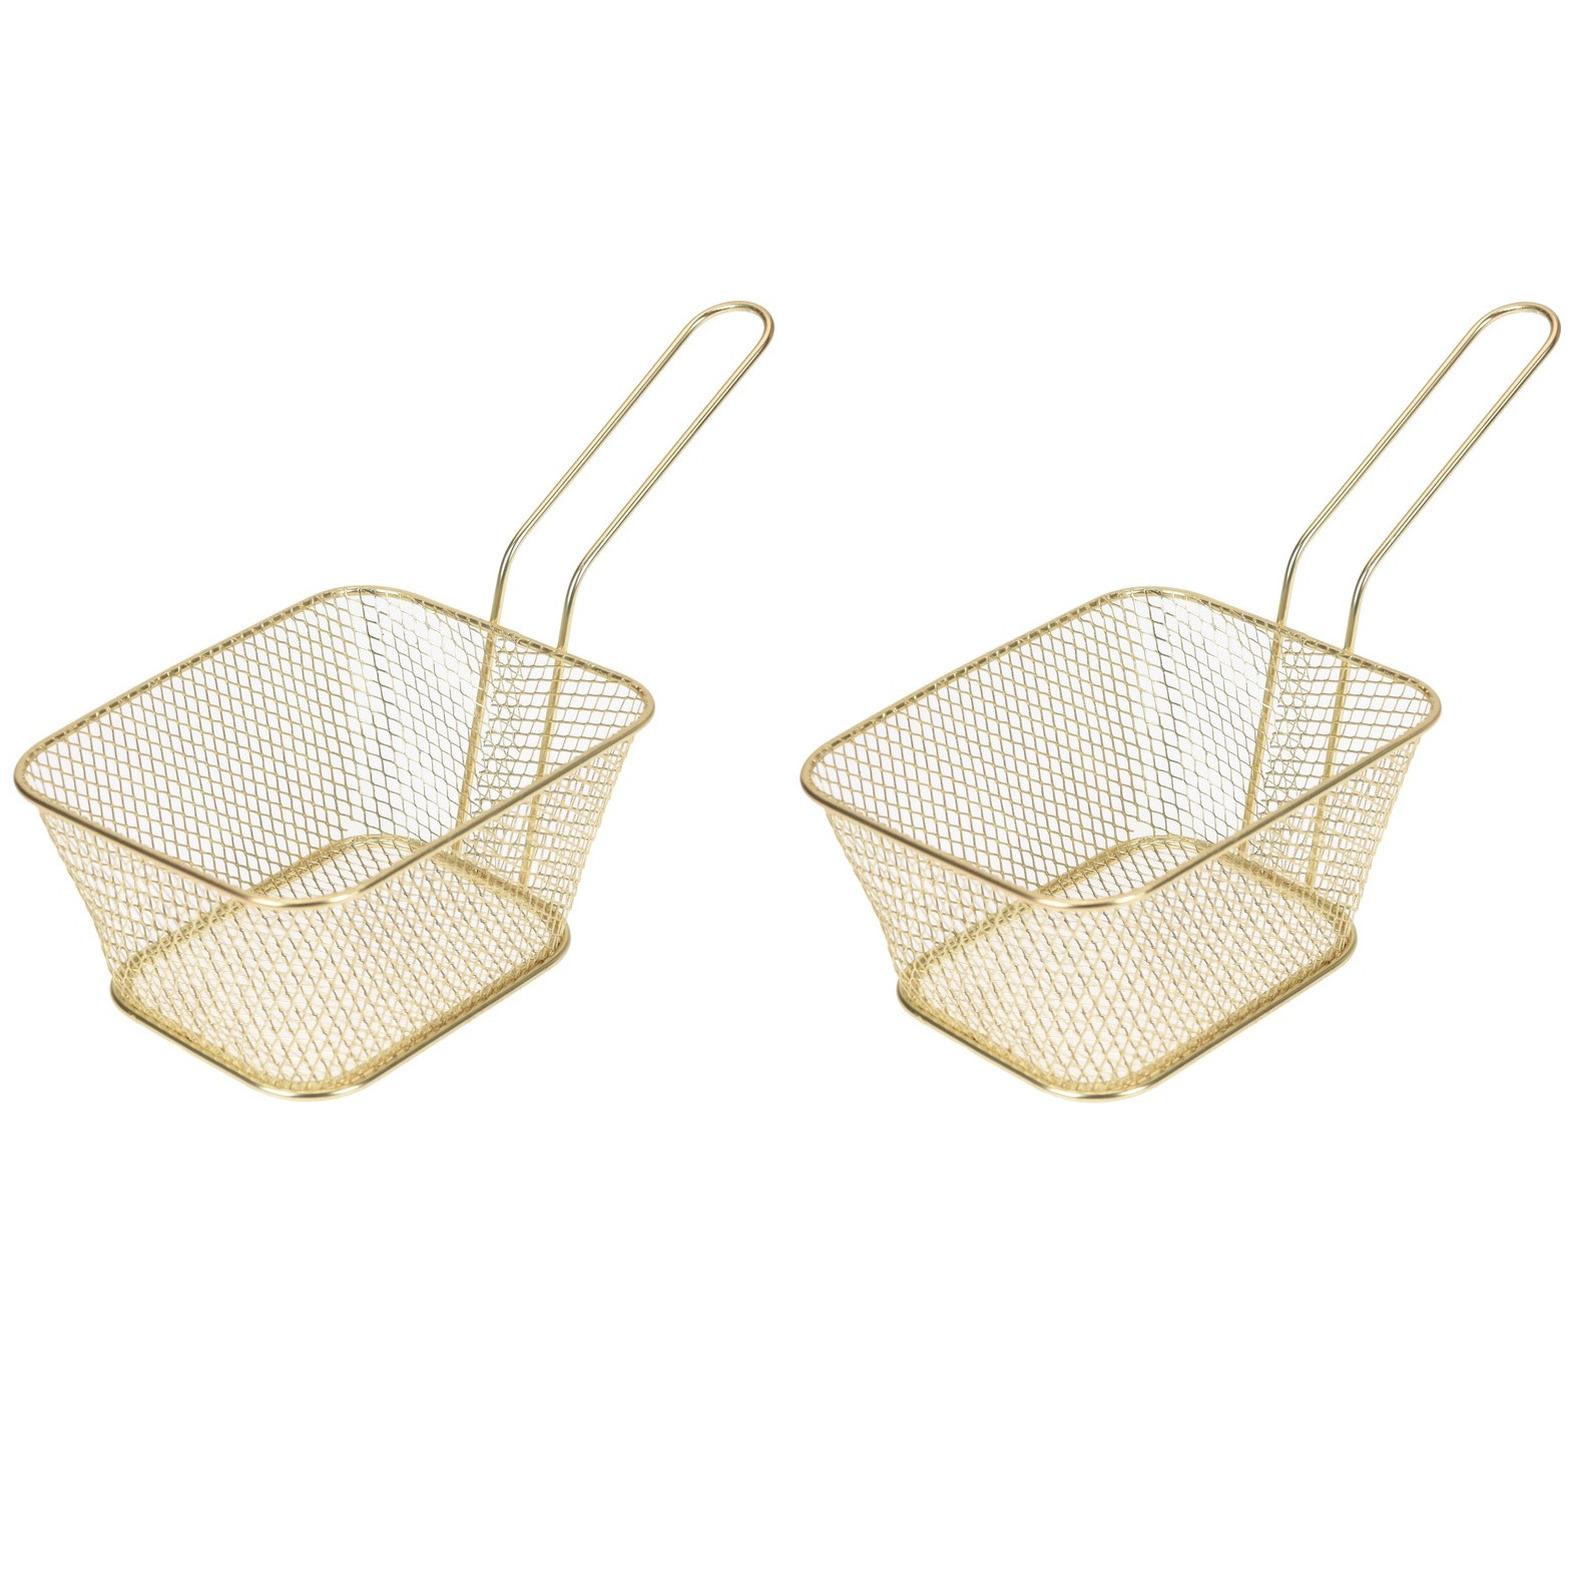 6x Gouden patat/snack serveermandjes/frituurmandjes 24 cm